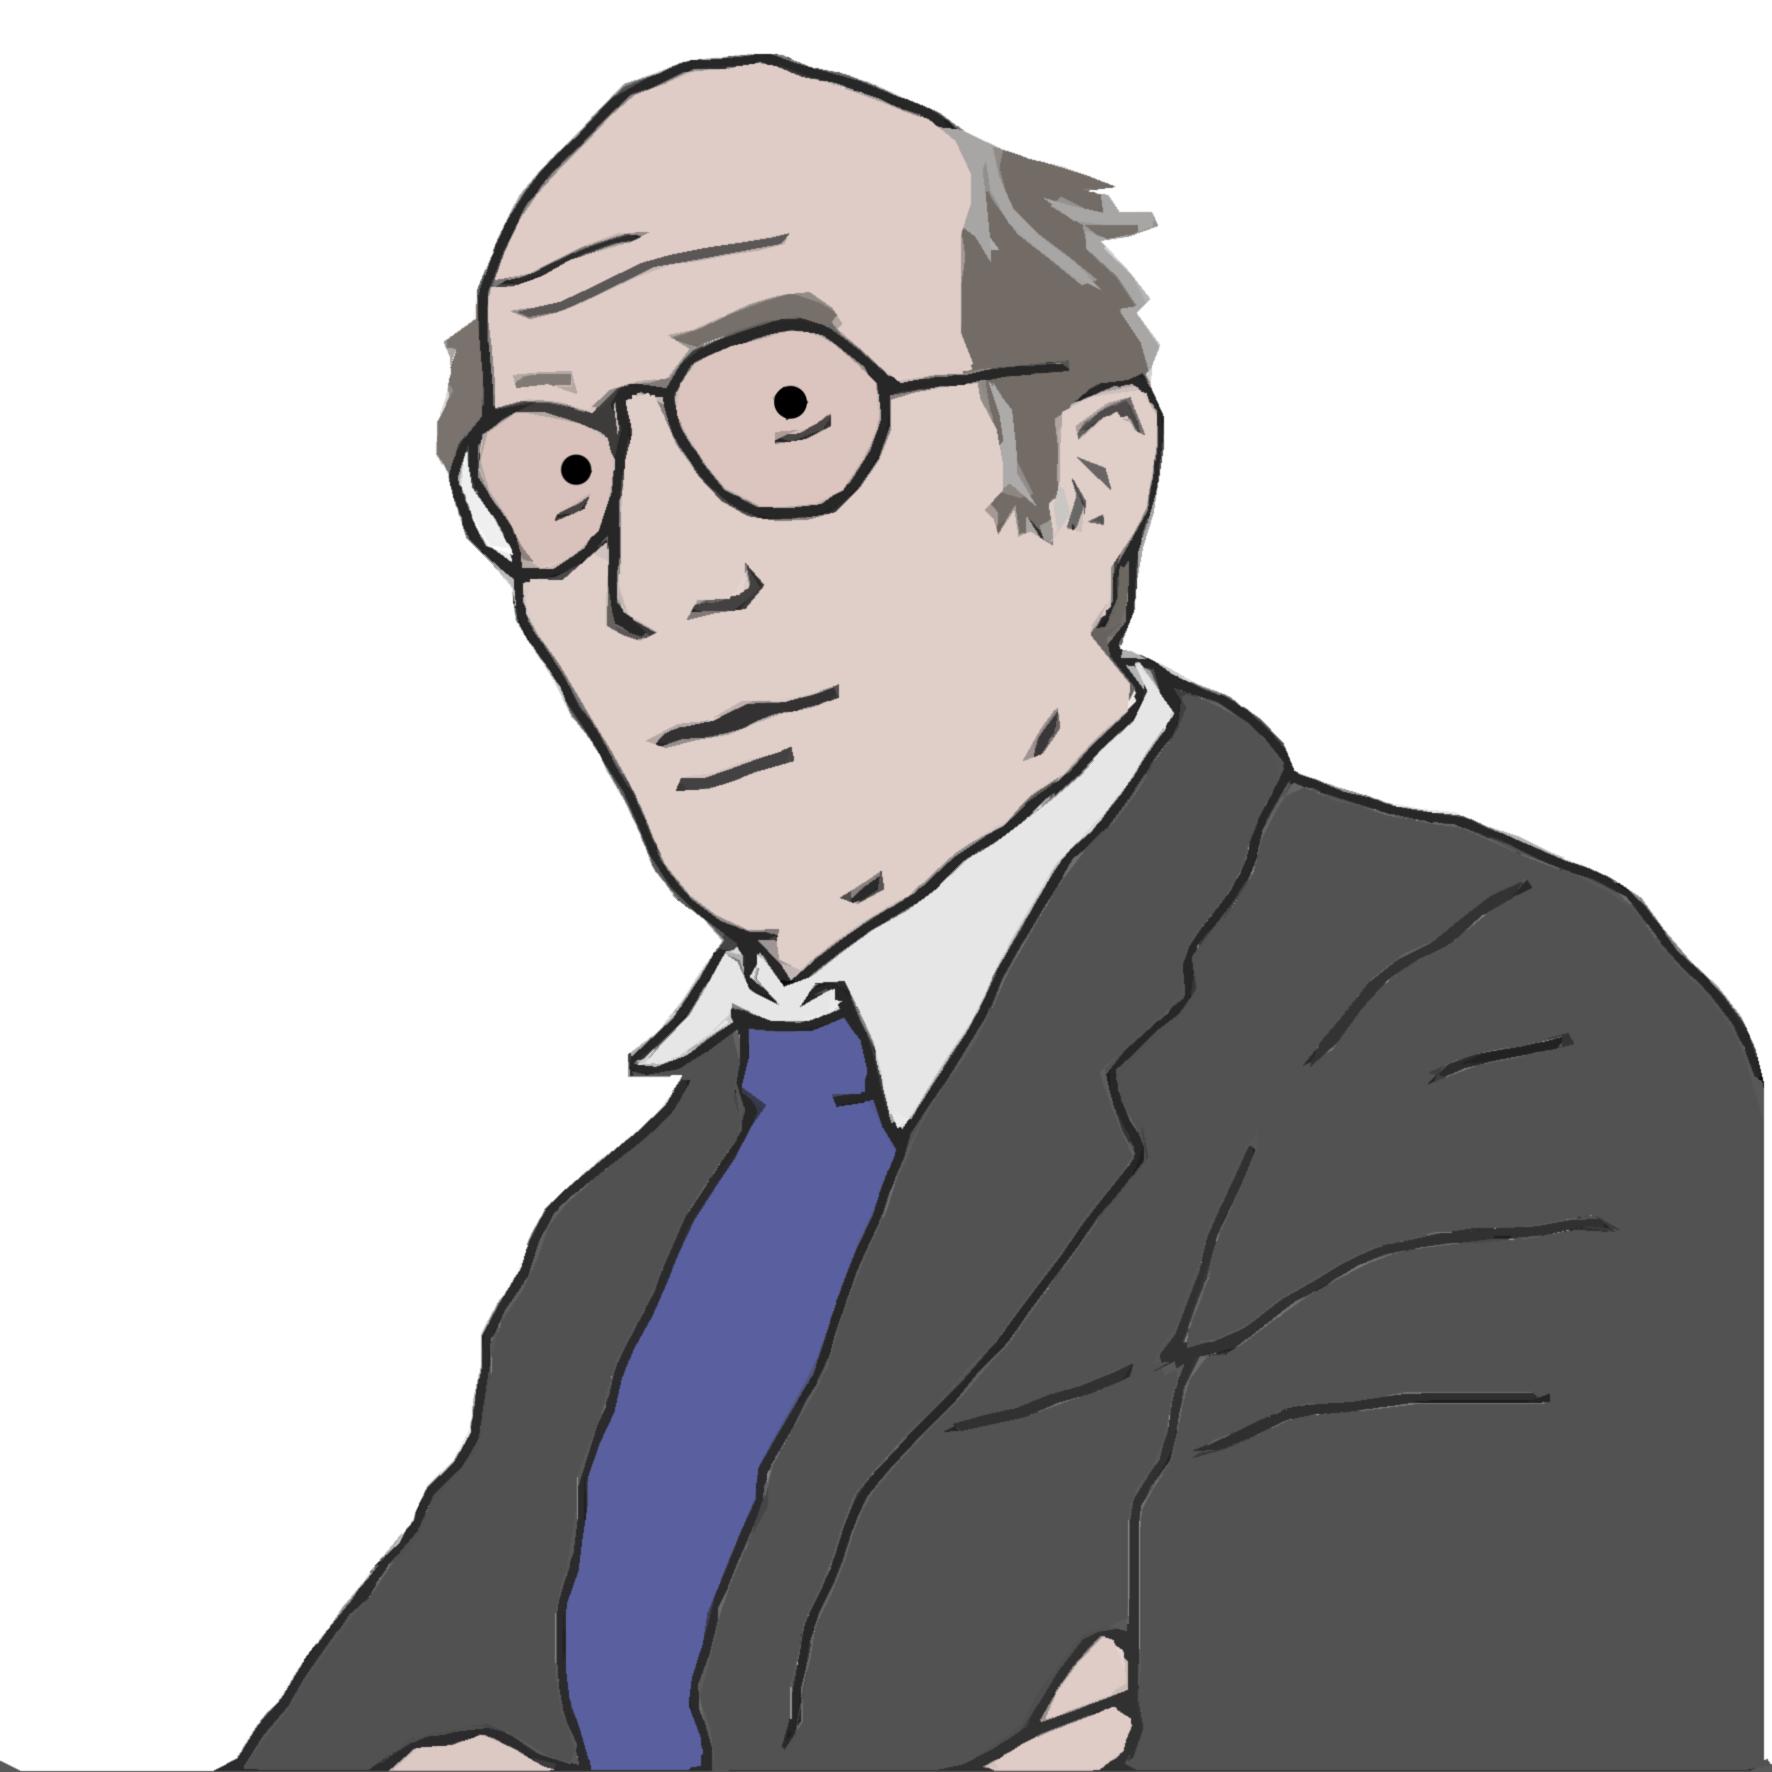 niklas luhmann essays on self-reference